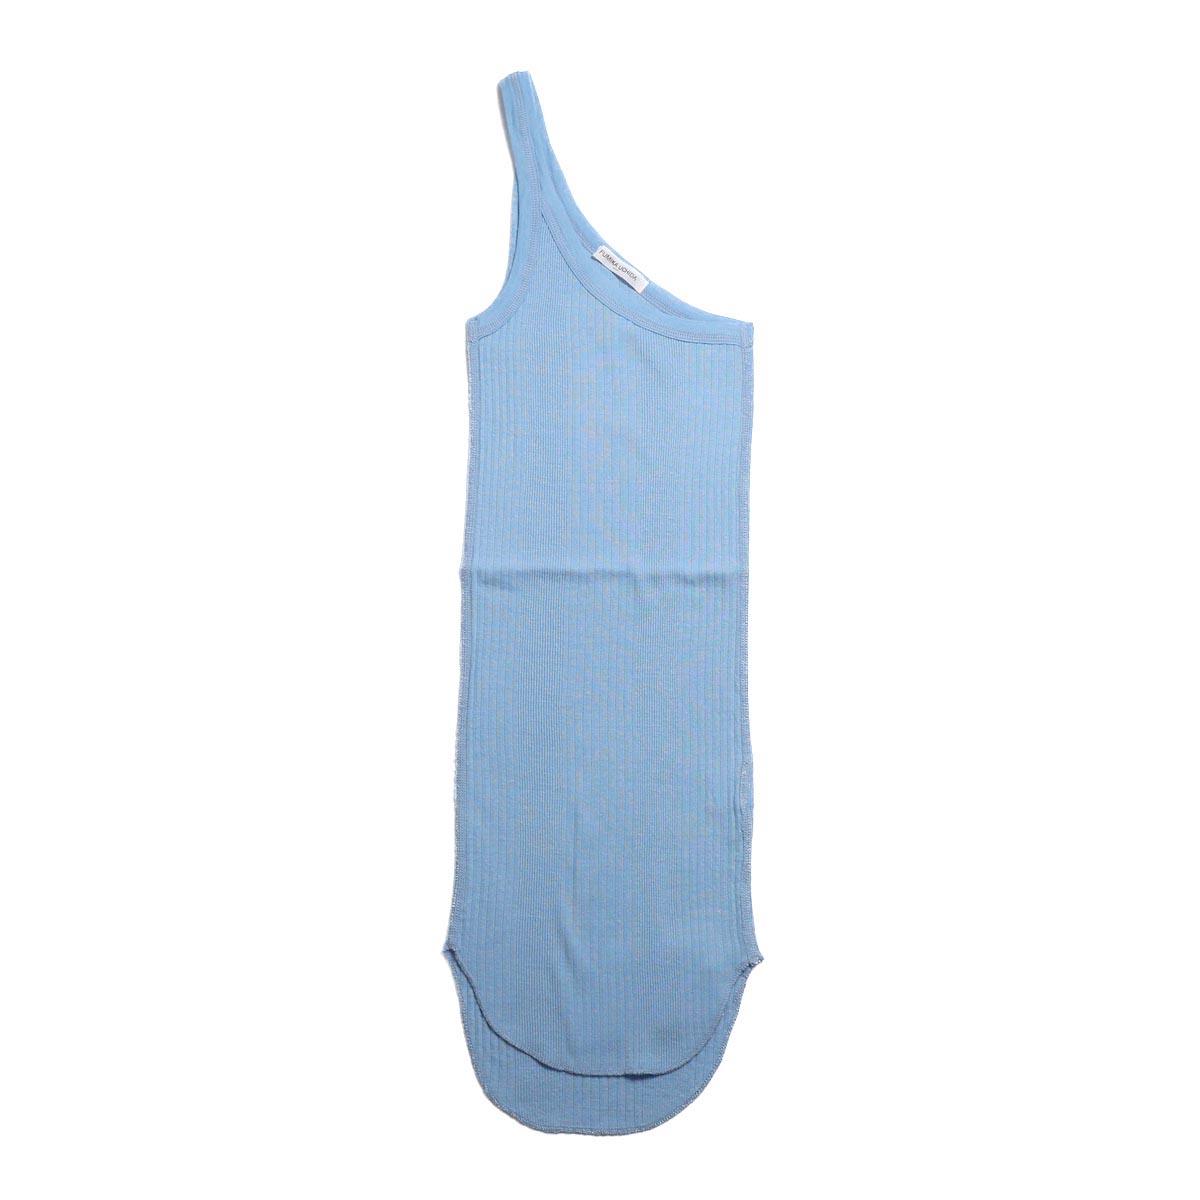 FUMIKA UCHIDA / Cotton Needle Drawing One Shoulder Tank Top -Sax